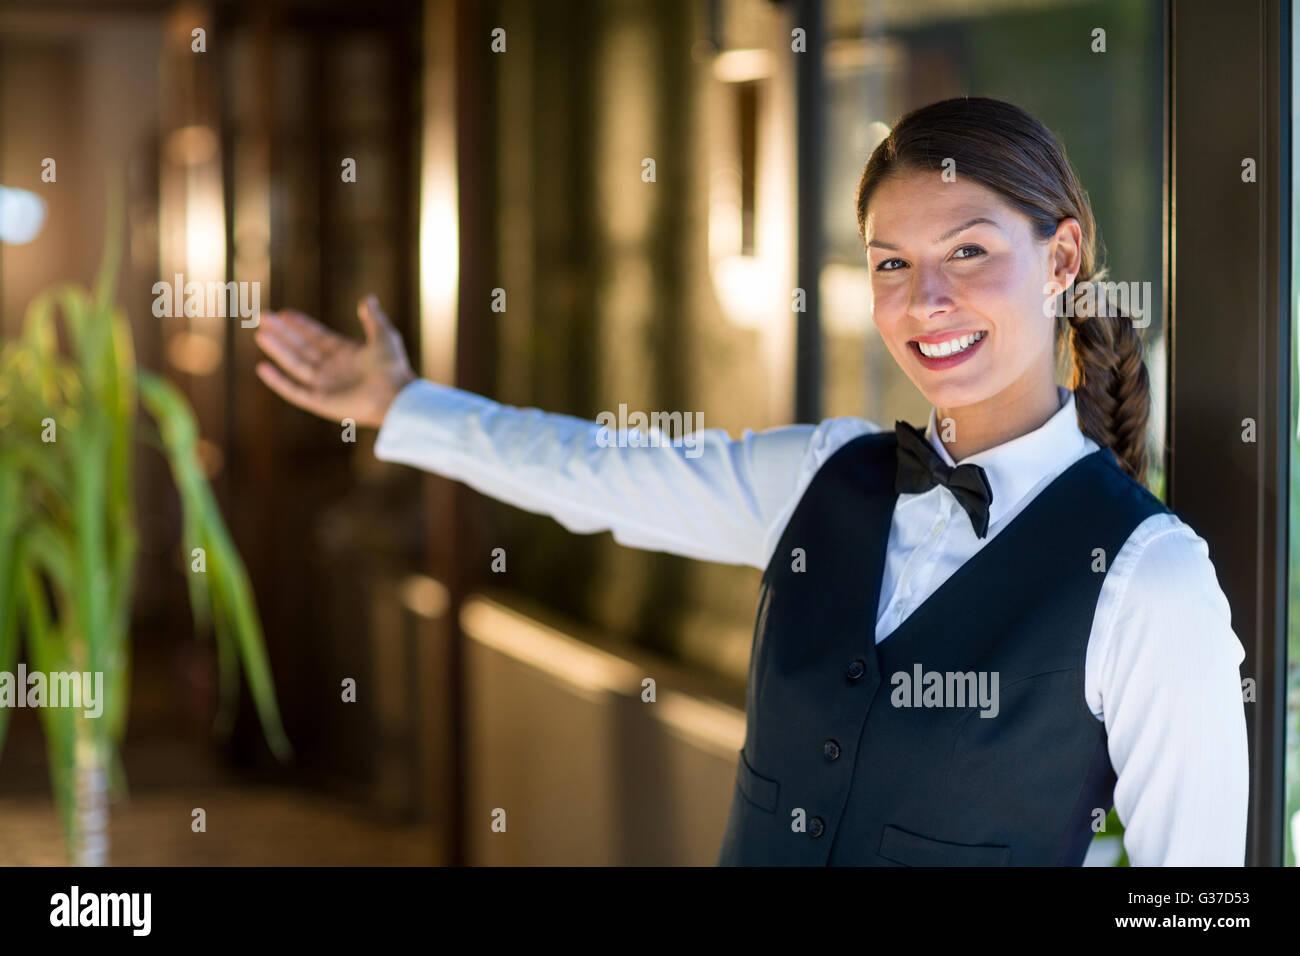 Portrait of smiling waitress accueillant Photo Stock